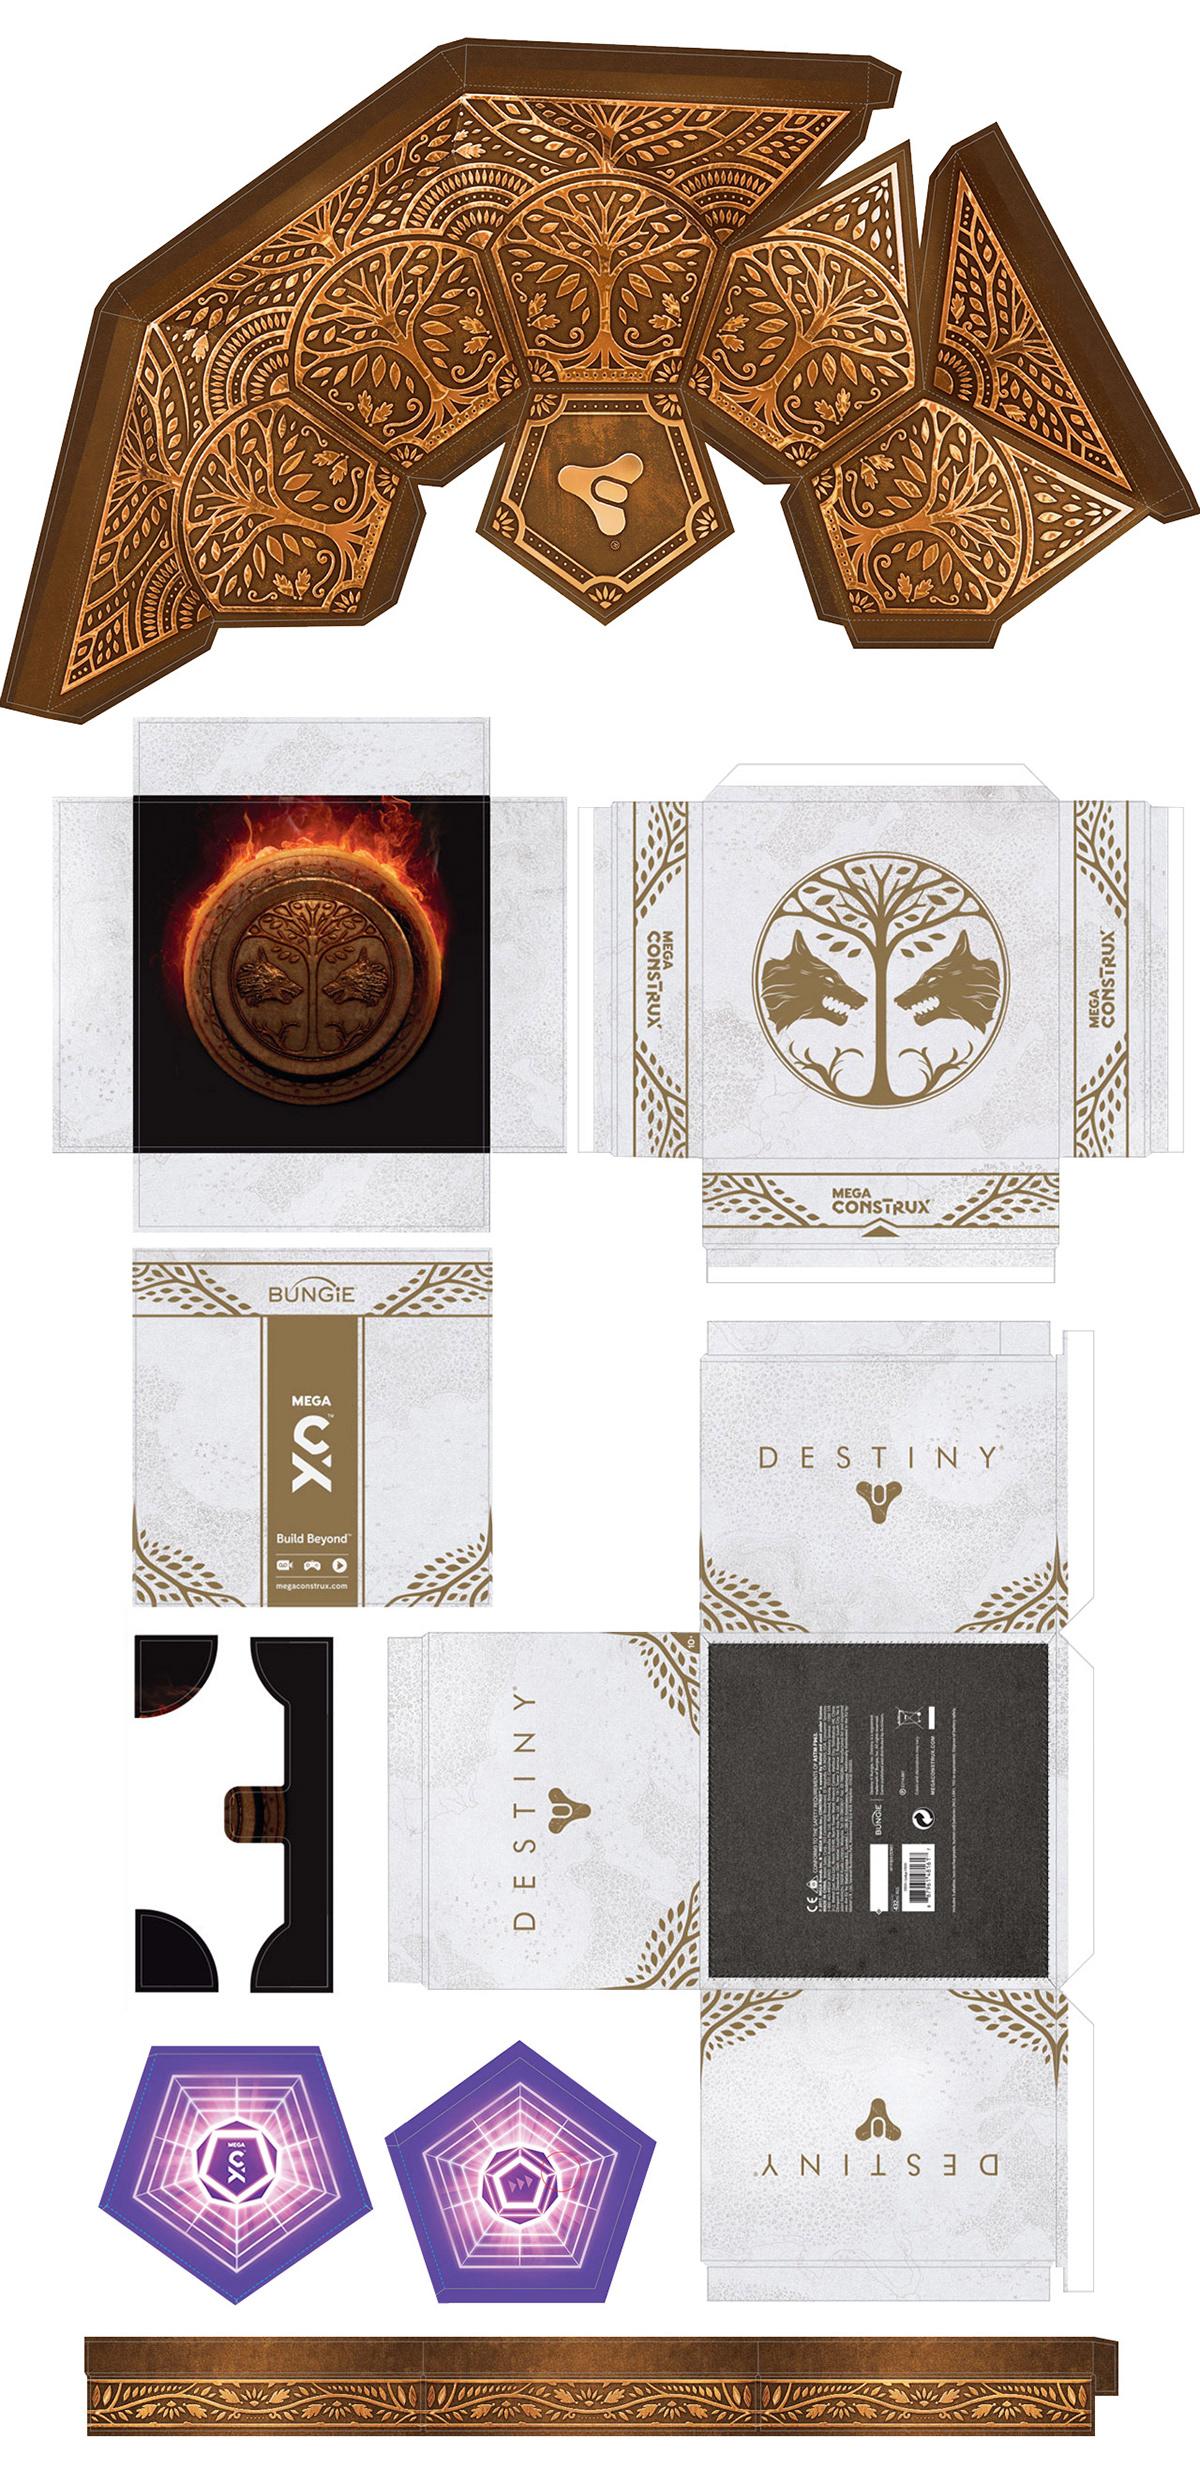 Bungie destiny exclusive graphic design  mattel Mega Bloks Packaging SDCC